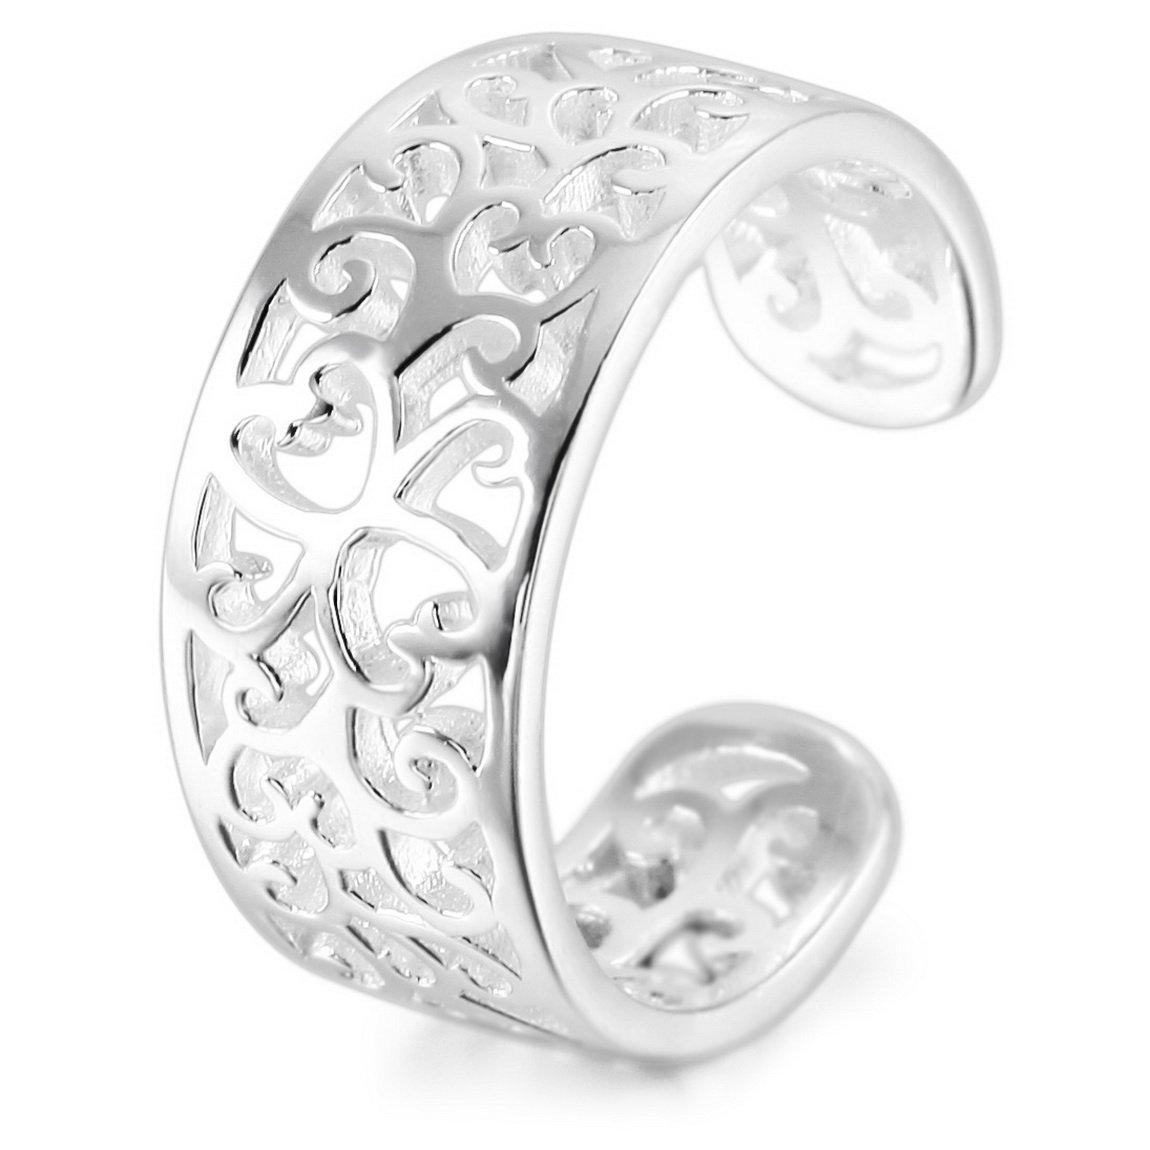 INBLUE Women's 925 Sterling Silver Toe Rings Open Rings Tail Ring Pattern Adjustable